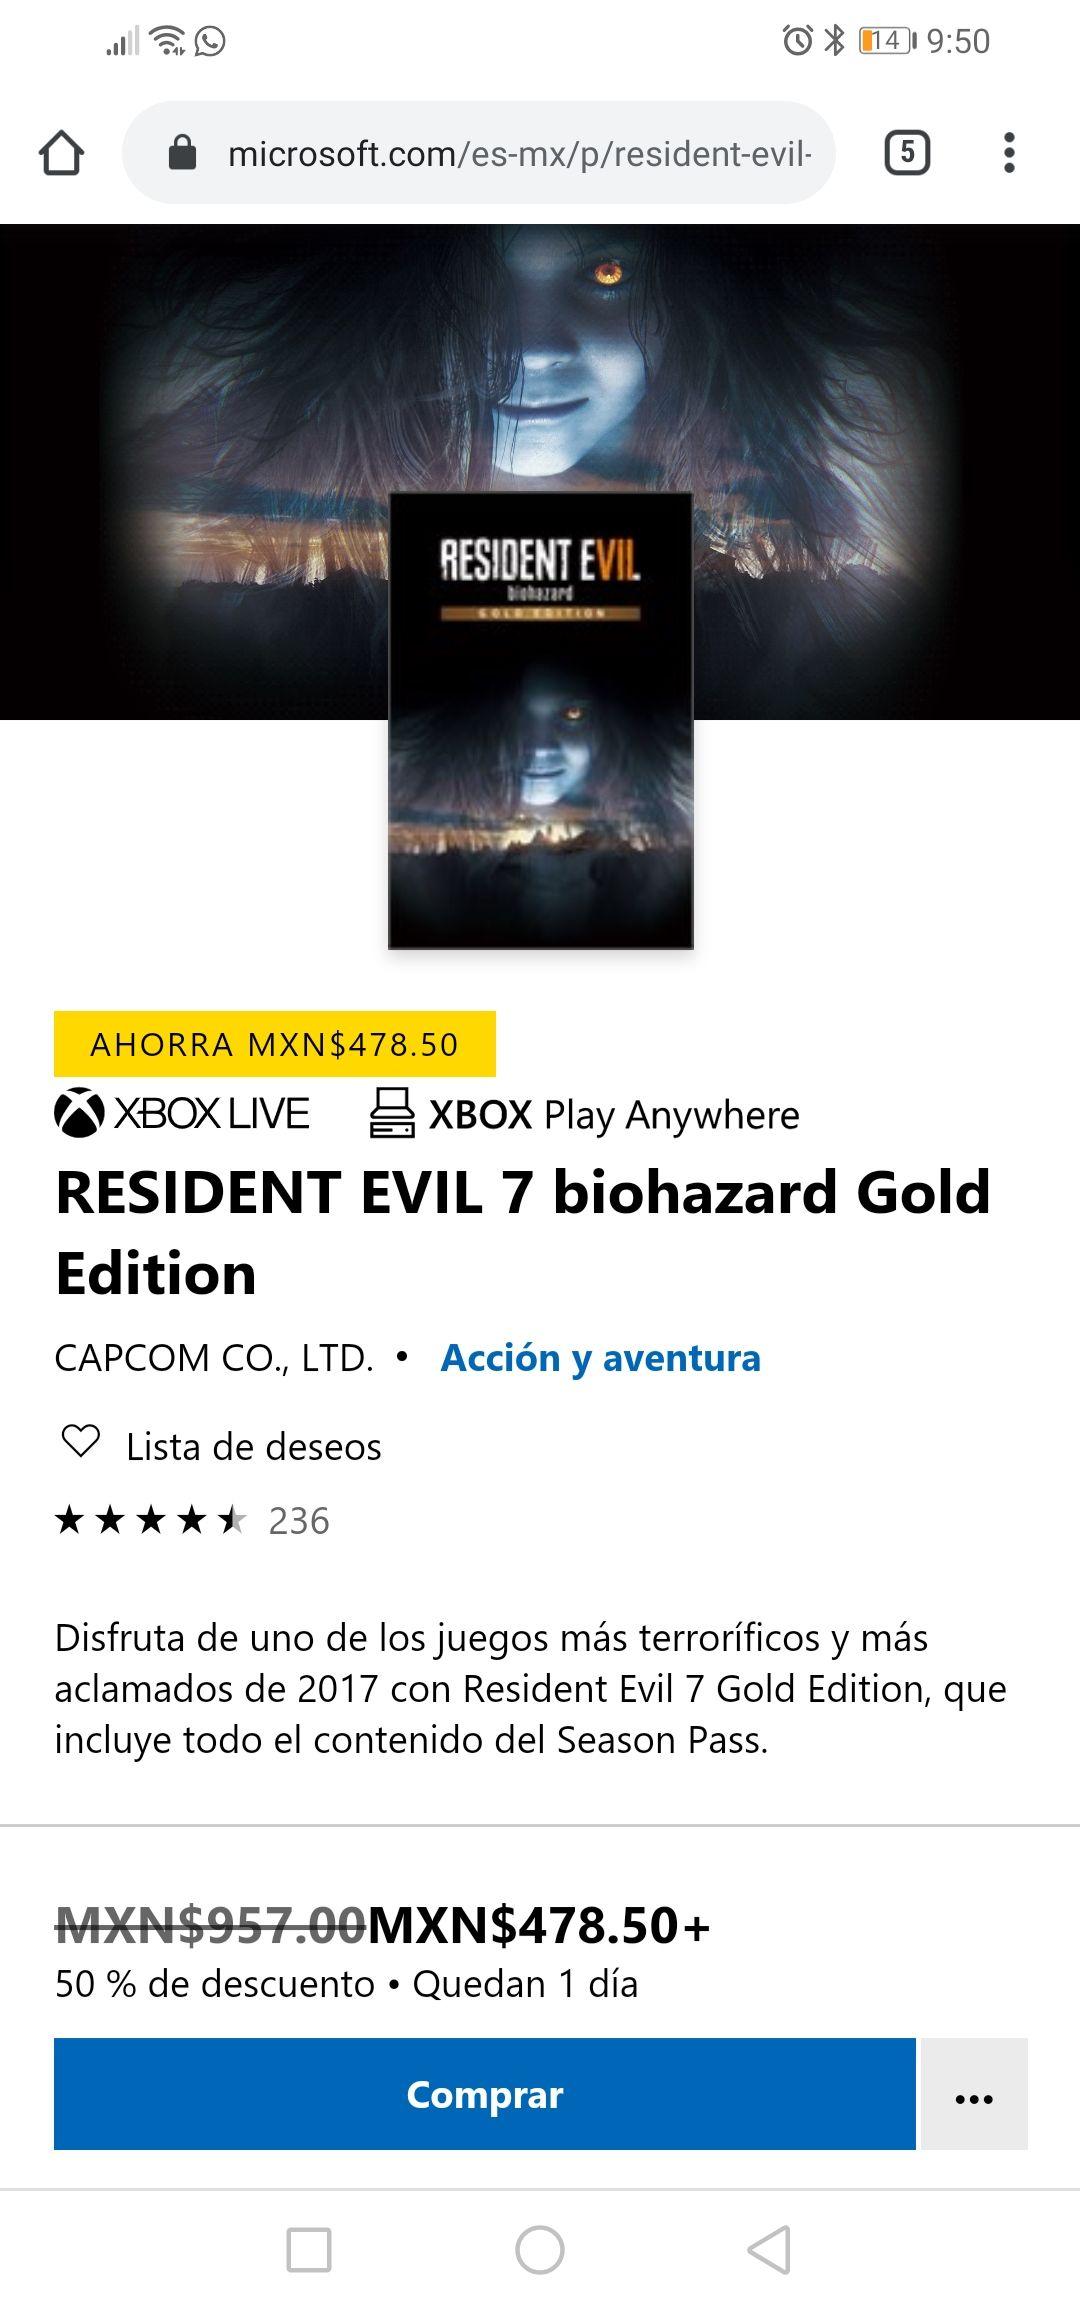 Microsoft store: Resident Evil 7 biohazard Gold Edition (xbox versión digital)